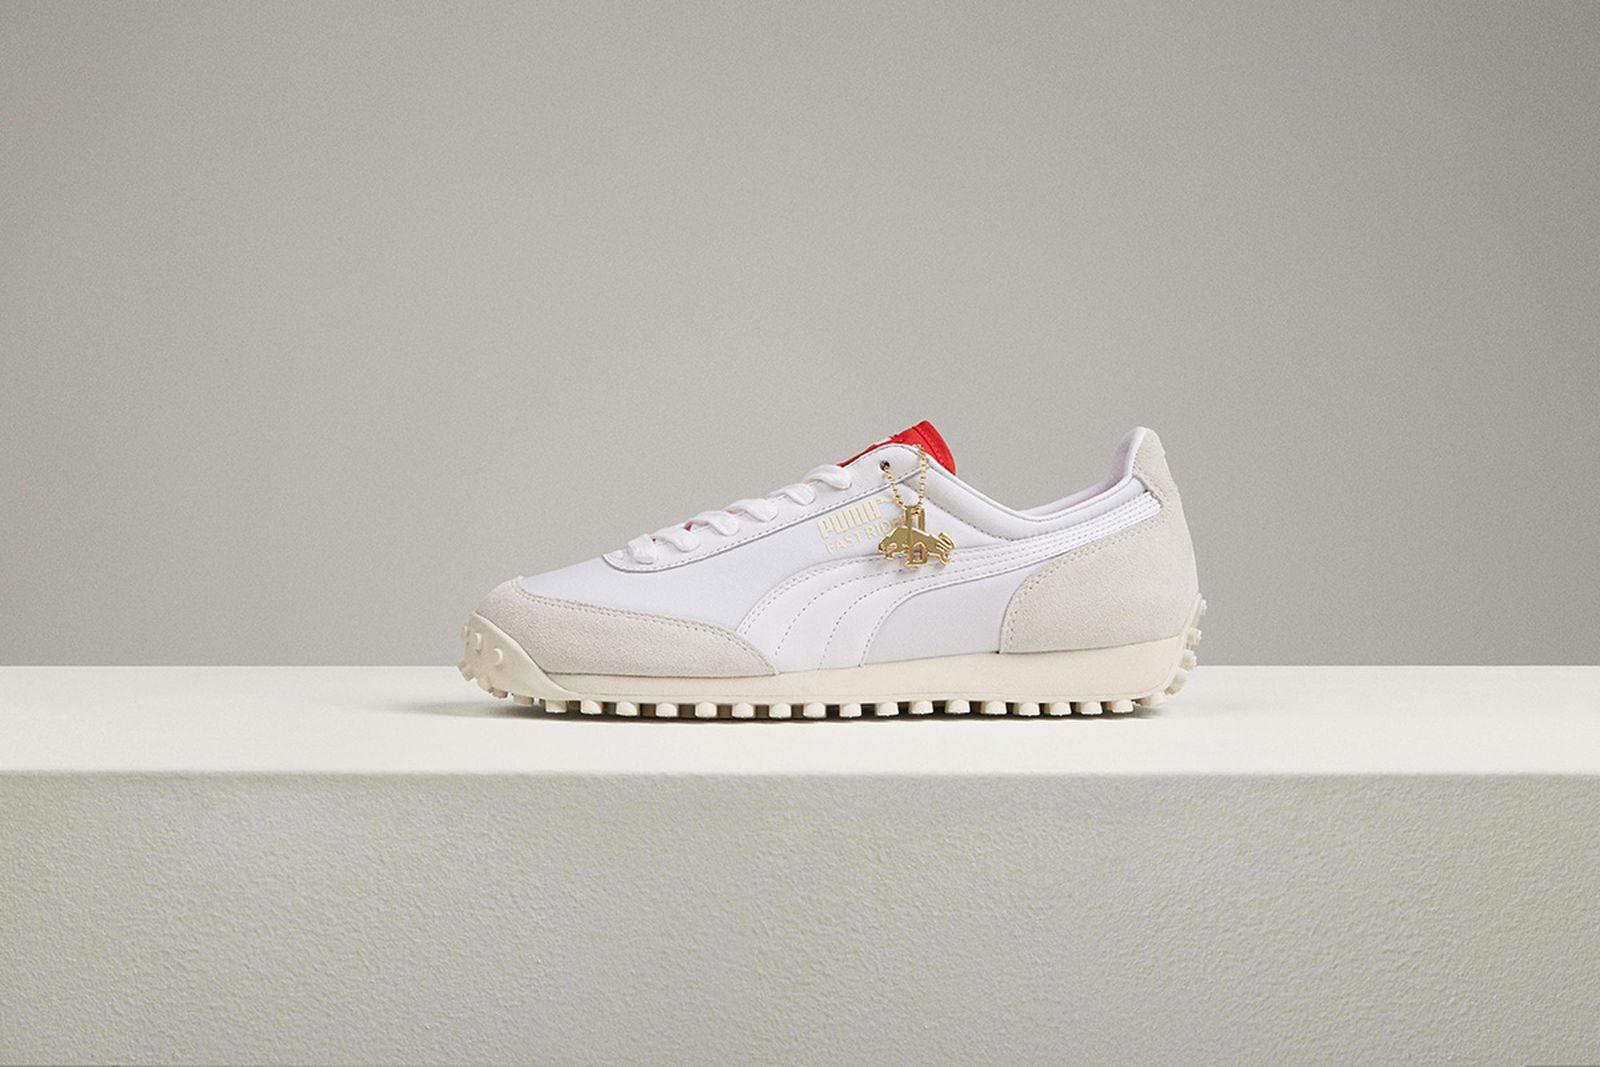 PUMA Rudolf Dassler Legacy Pack sneaker